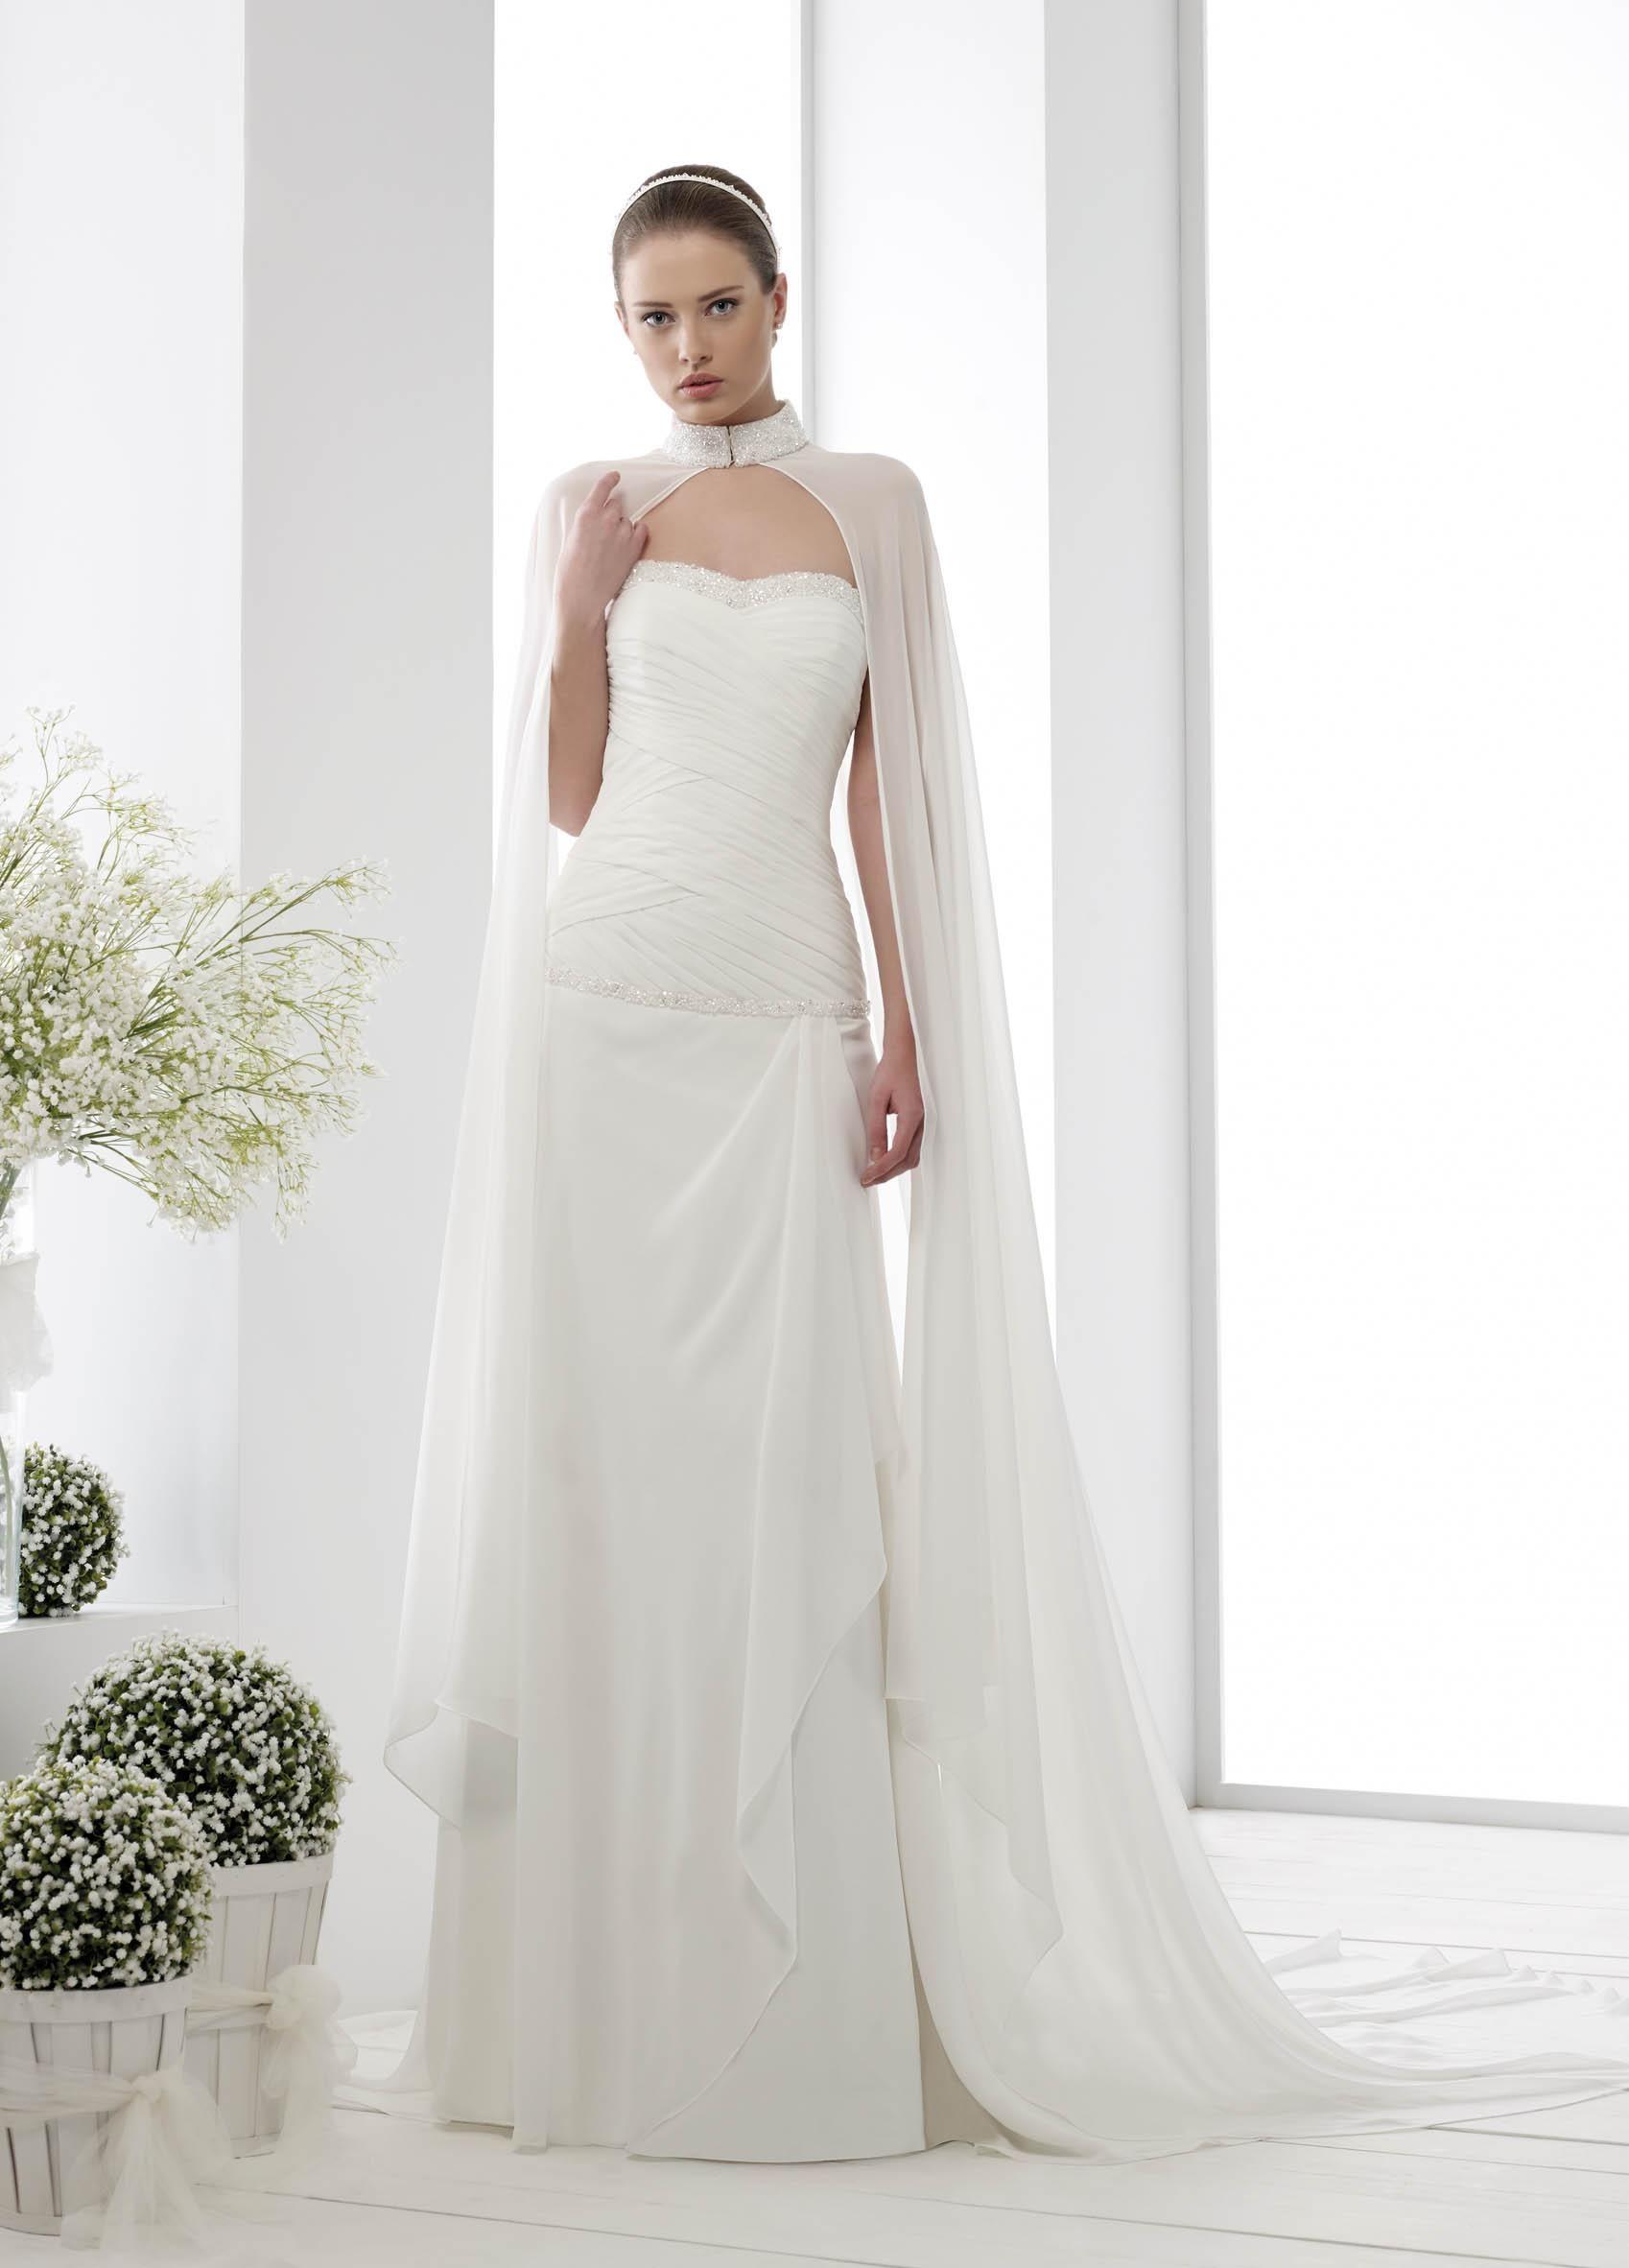 Hochzeitskleid nicole kollektion jolies wedding gowns